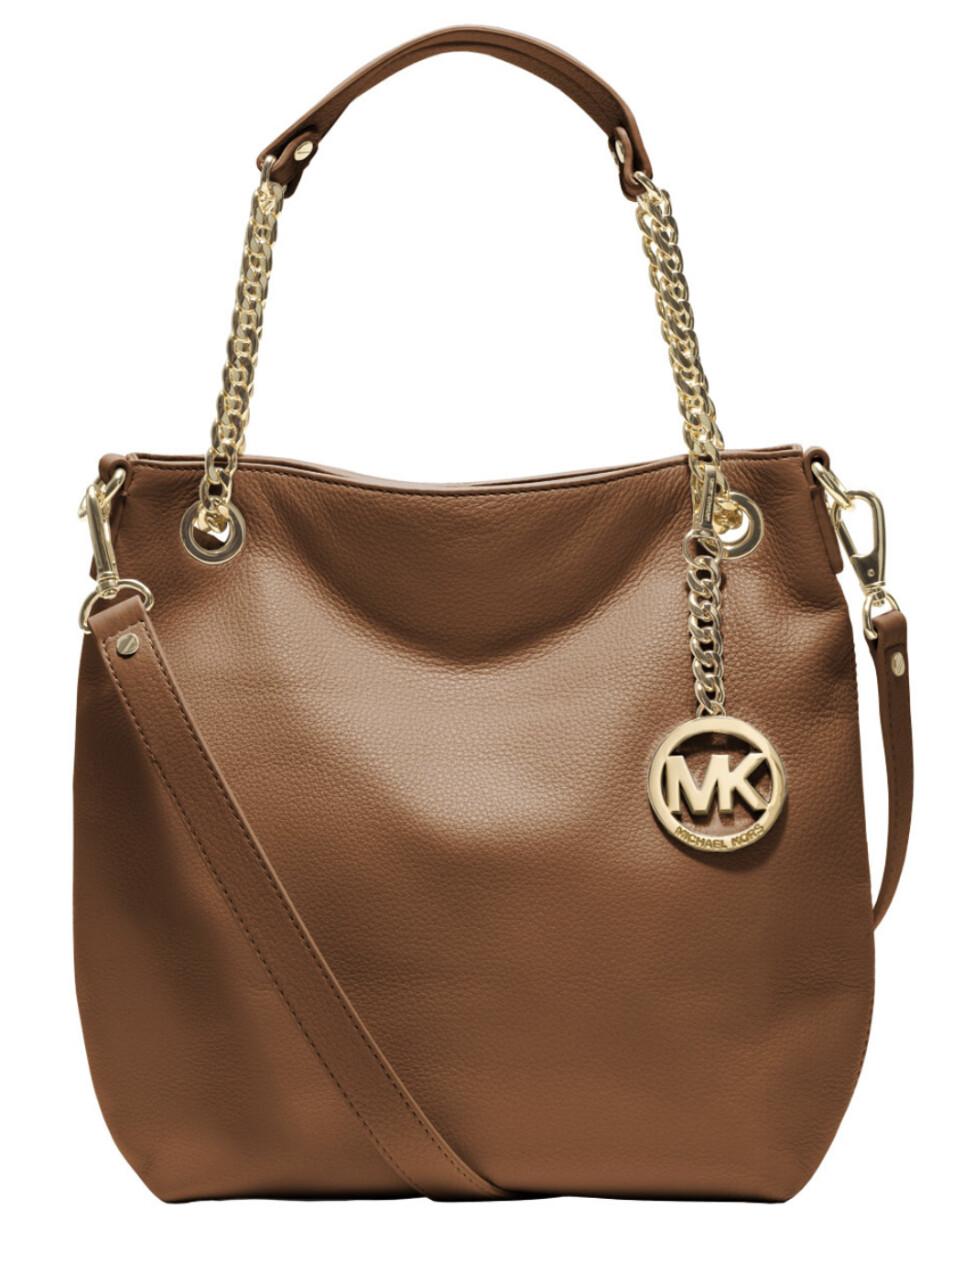 MICHAEL KORS Tan Pebble Leather Jet Set Leather CrossBody / Shoulder Bag